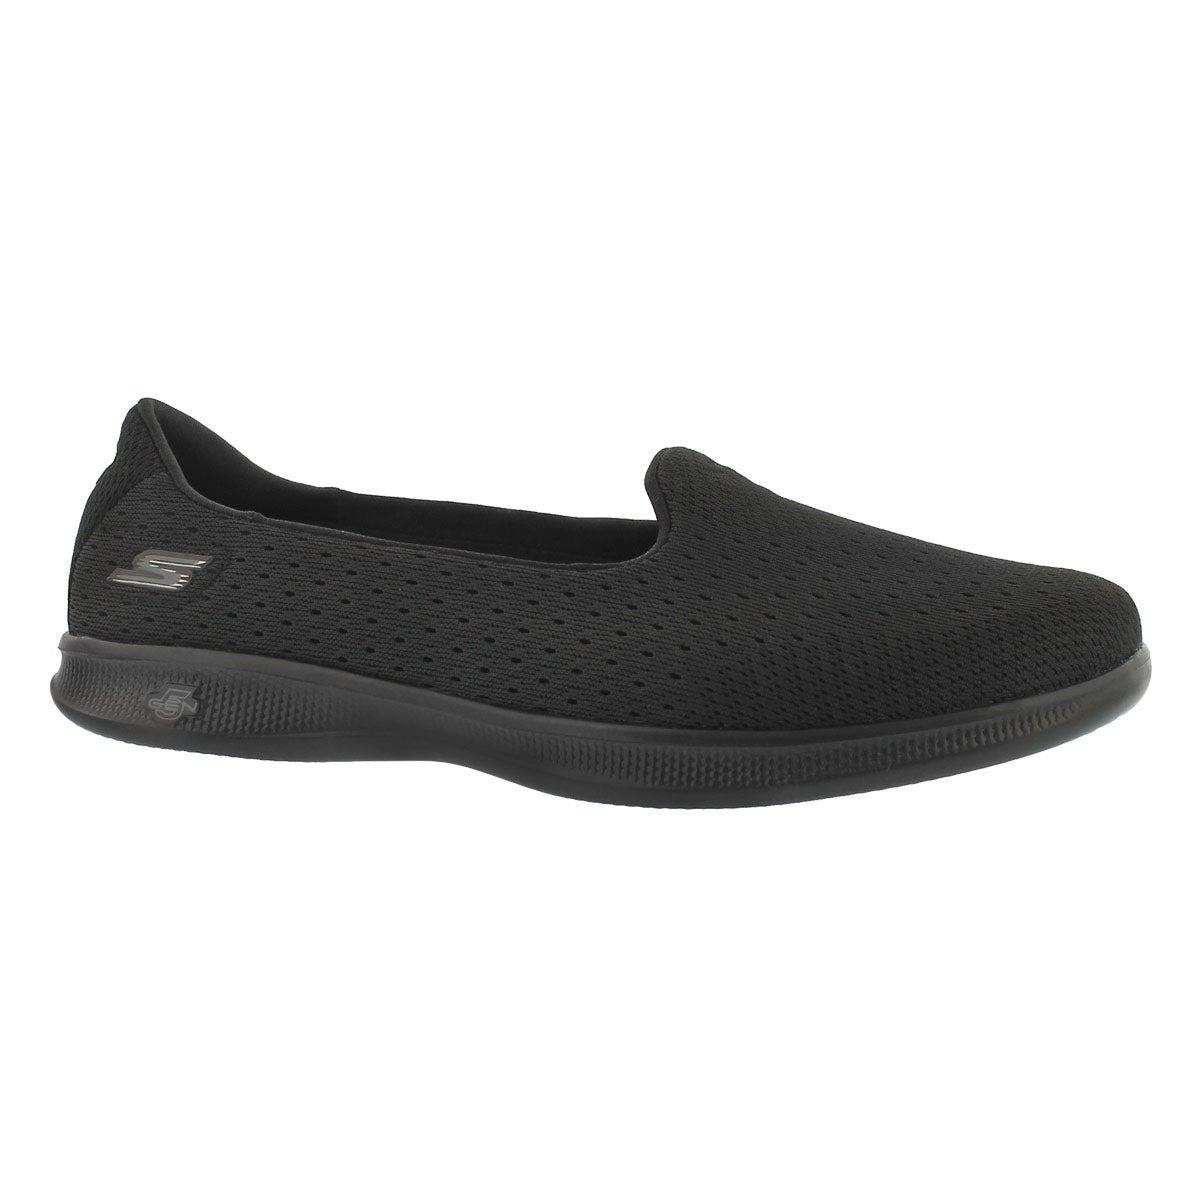 Women's GO STEP LITE ORIGIN blk walking shoes